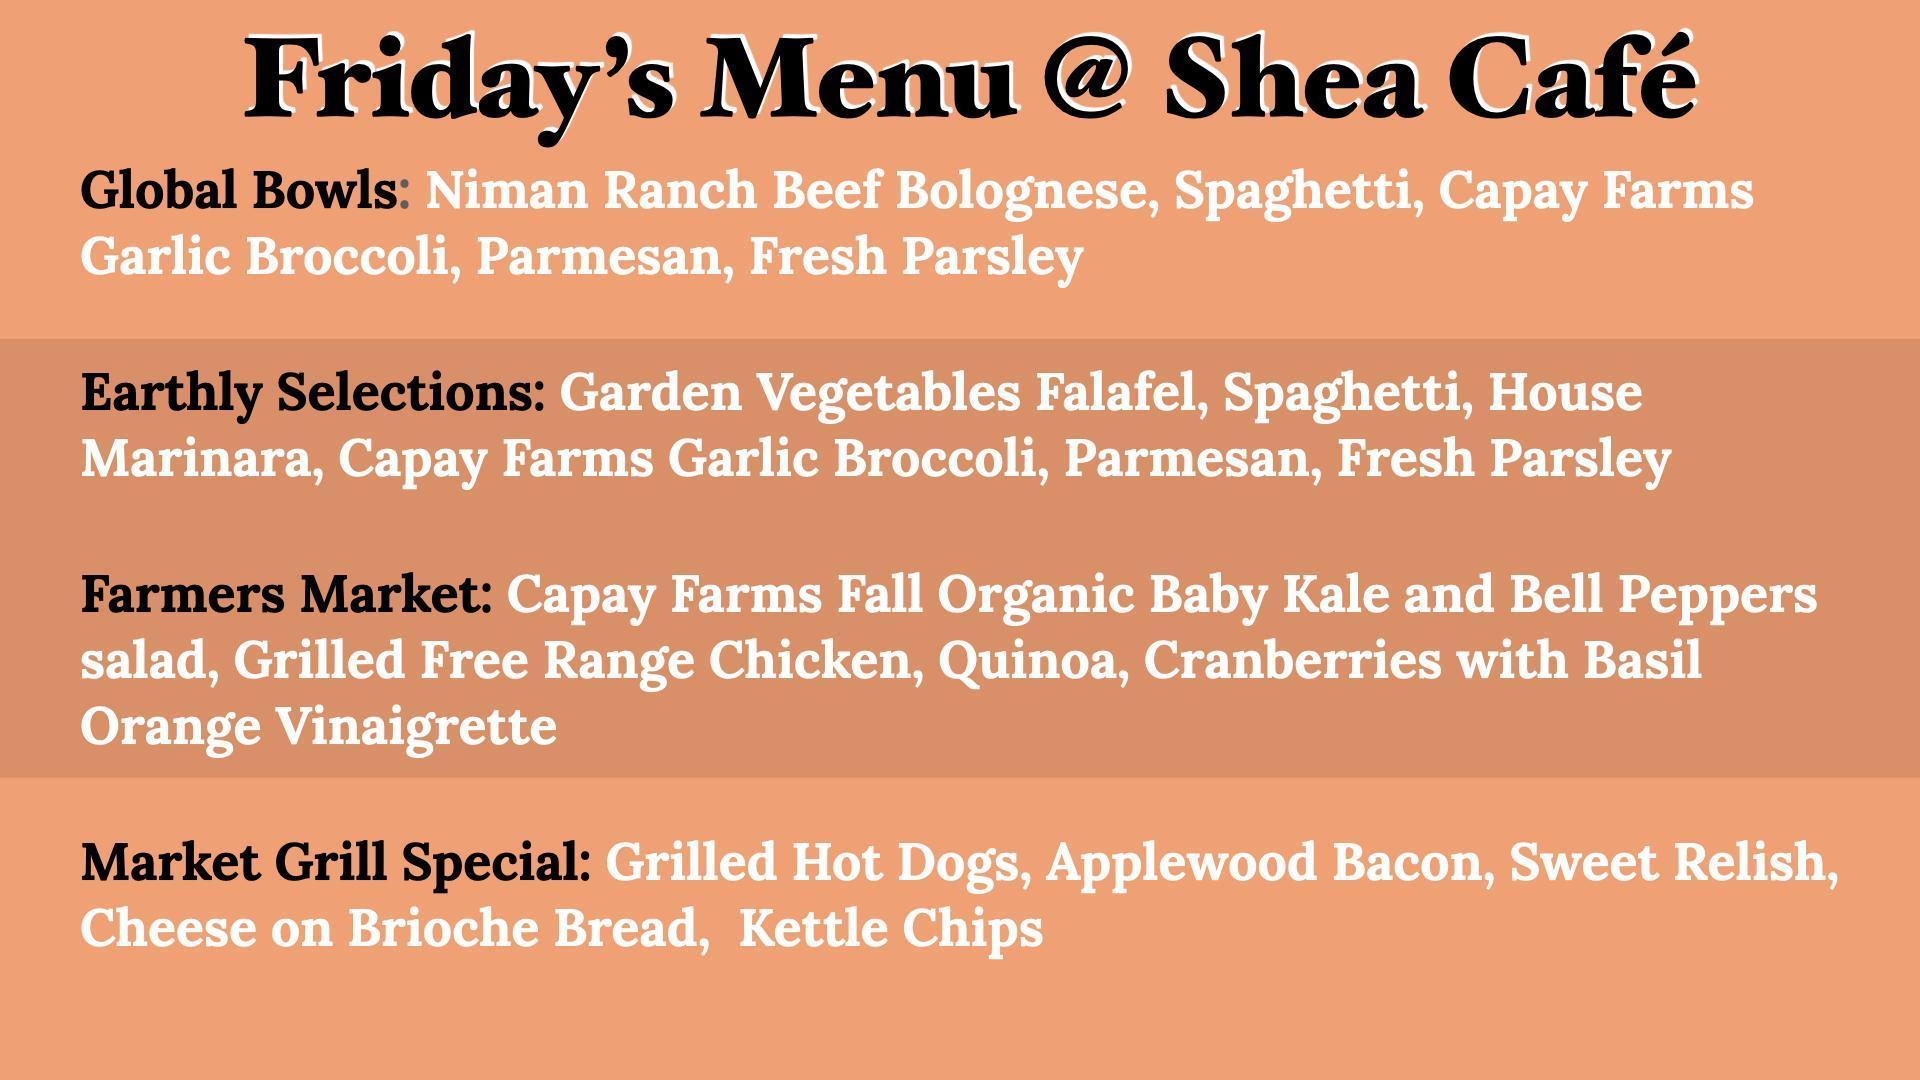 Friday's Shea Cafe Menu - October 22, 2021